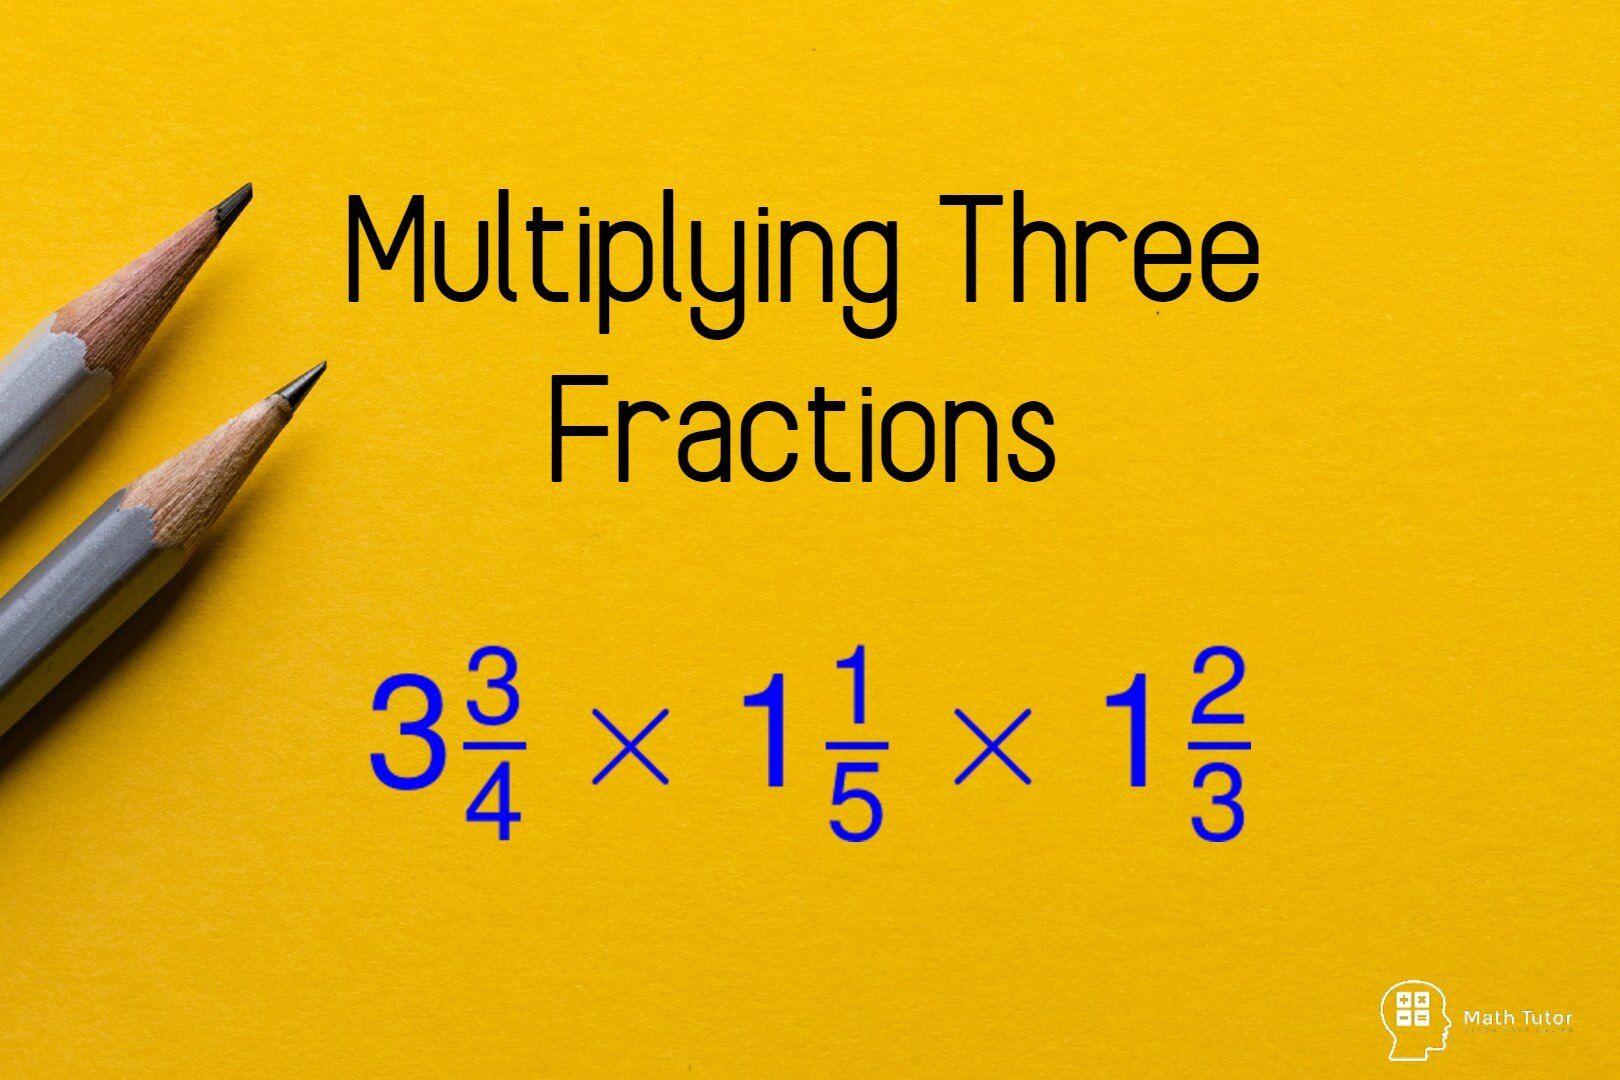 multiplying three fractions